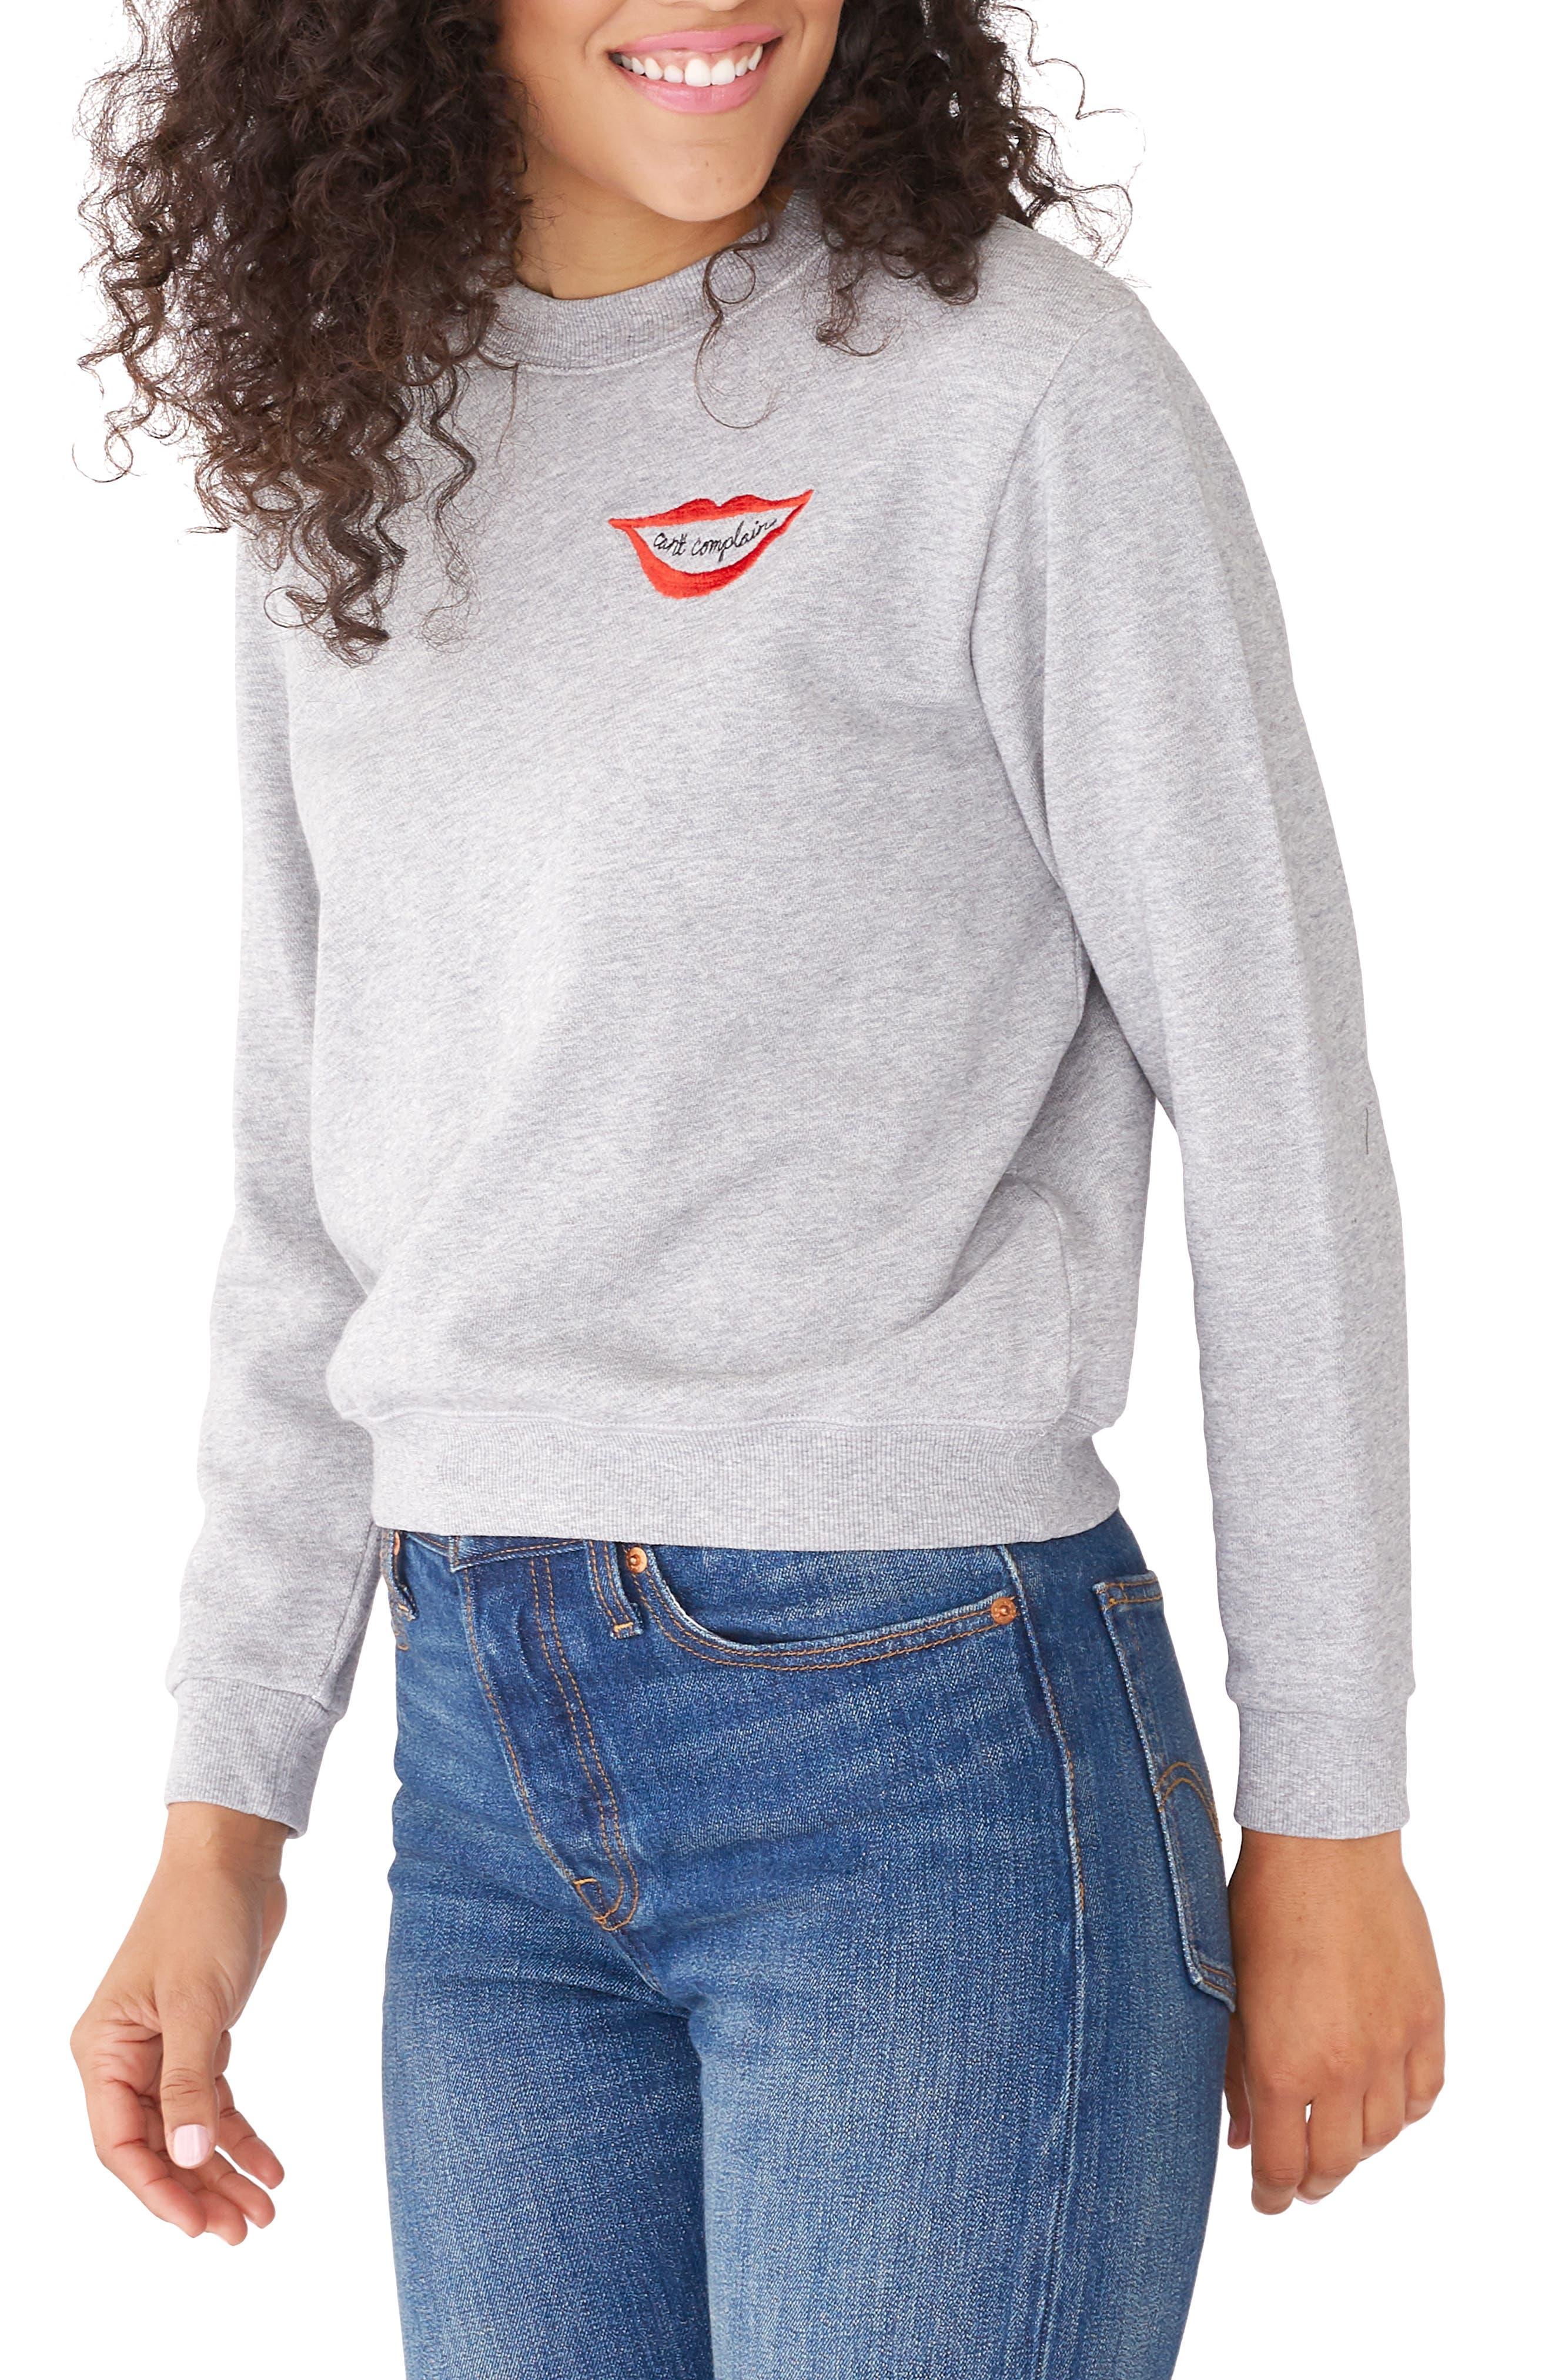 BAN.DO Can'T Complain Sweatshirt in Grey